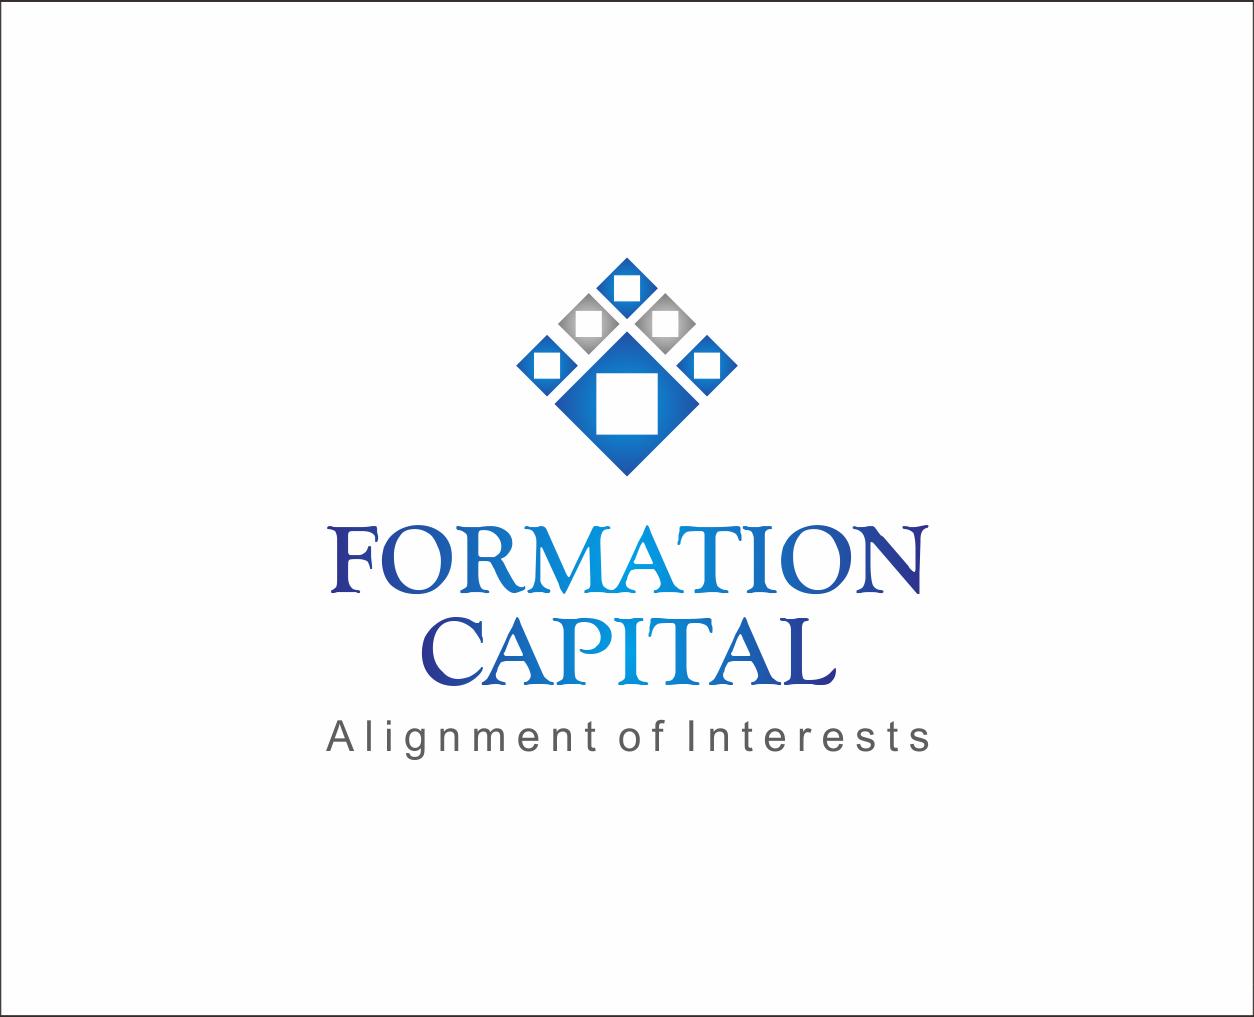 Logo Design by Armada Jamaluddin - Entry No. 204 in the Logo Design Contest Inspiring Logo Design for Formation Capital.